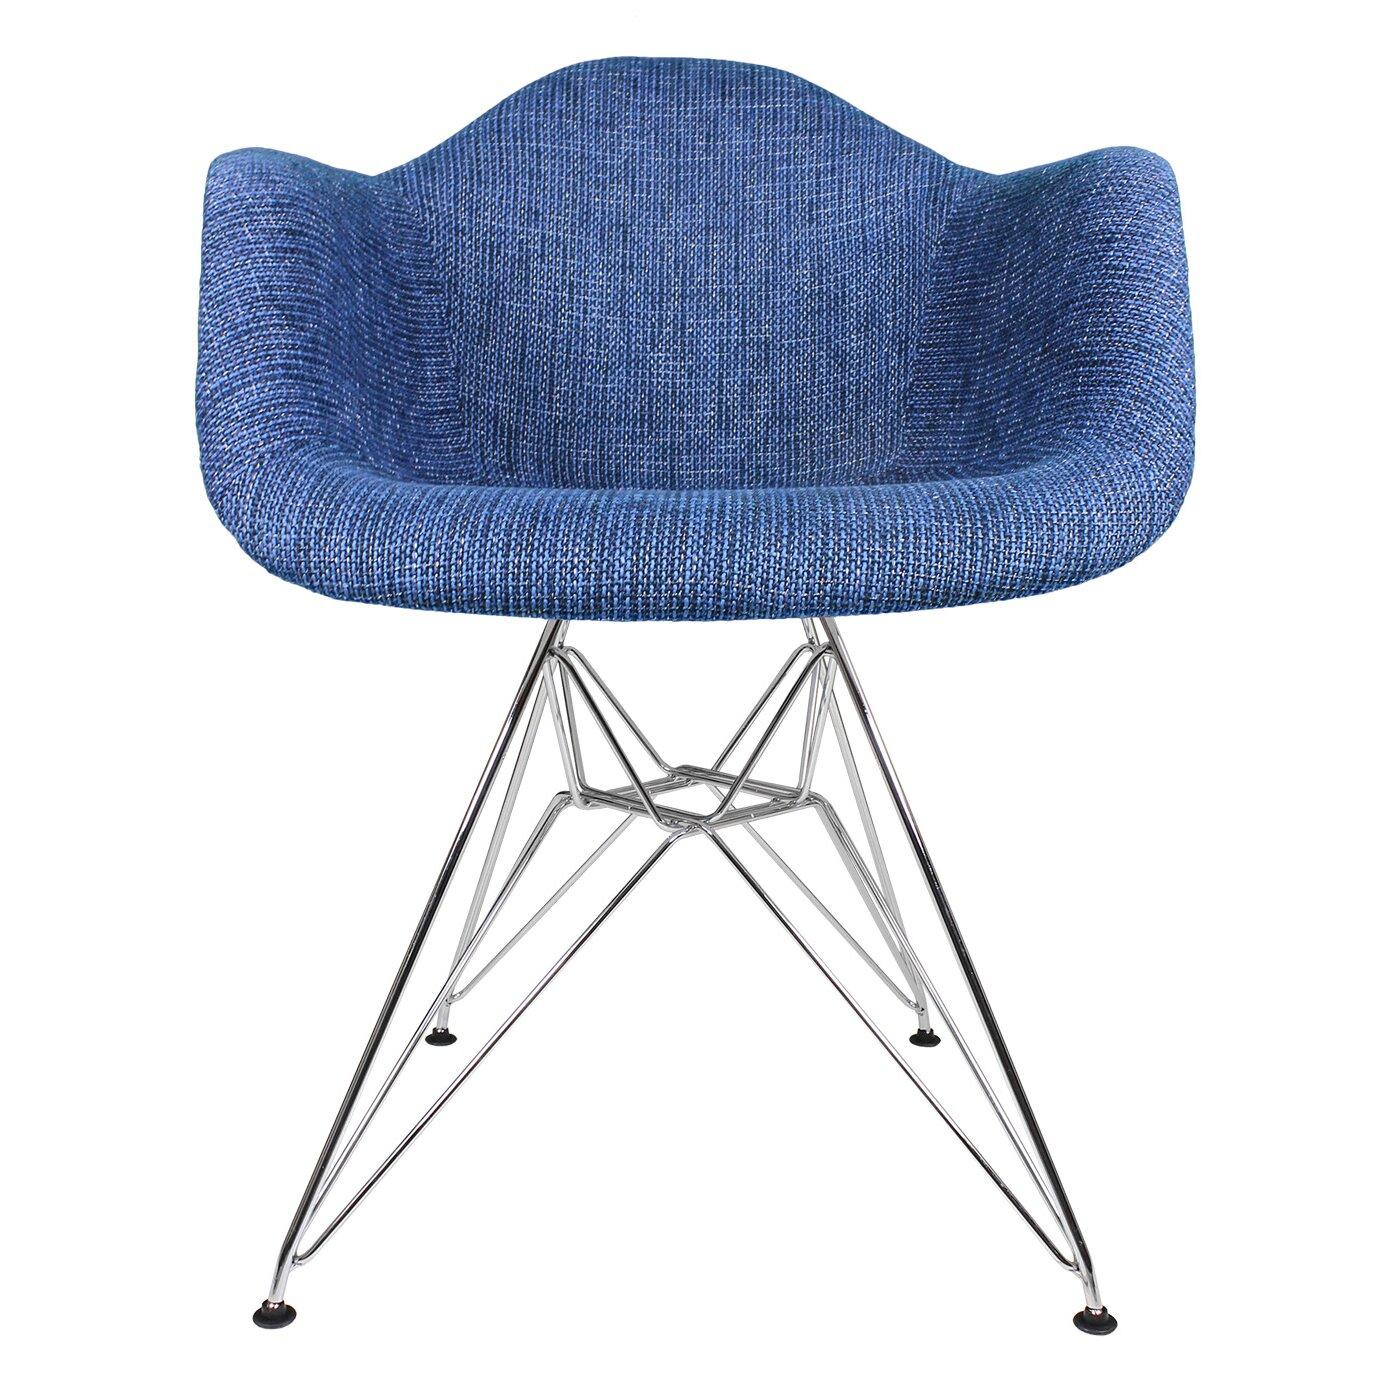 Emodern decor mid century modern arm chair reviews for Emodern decor